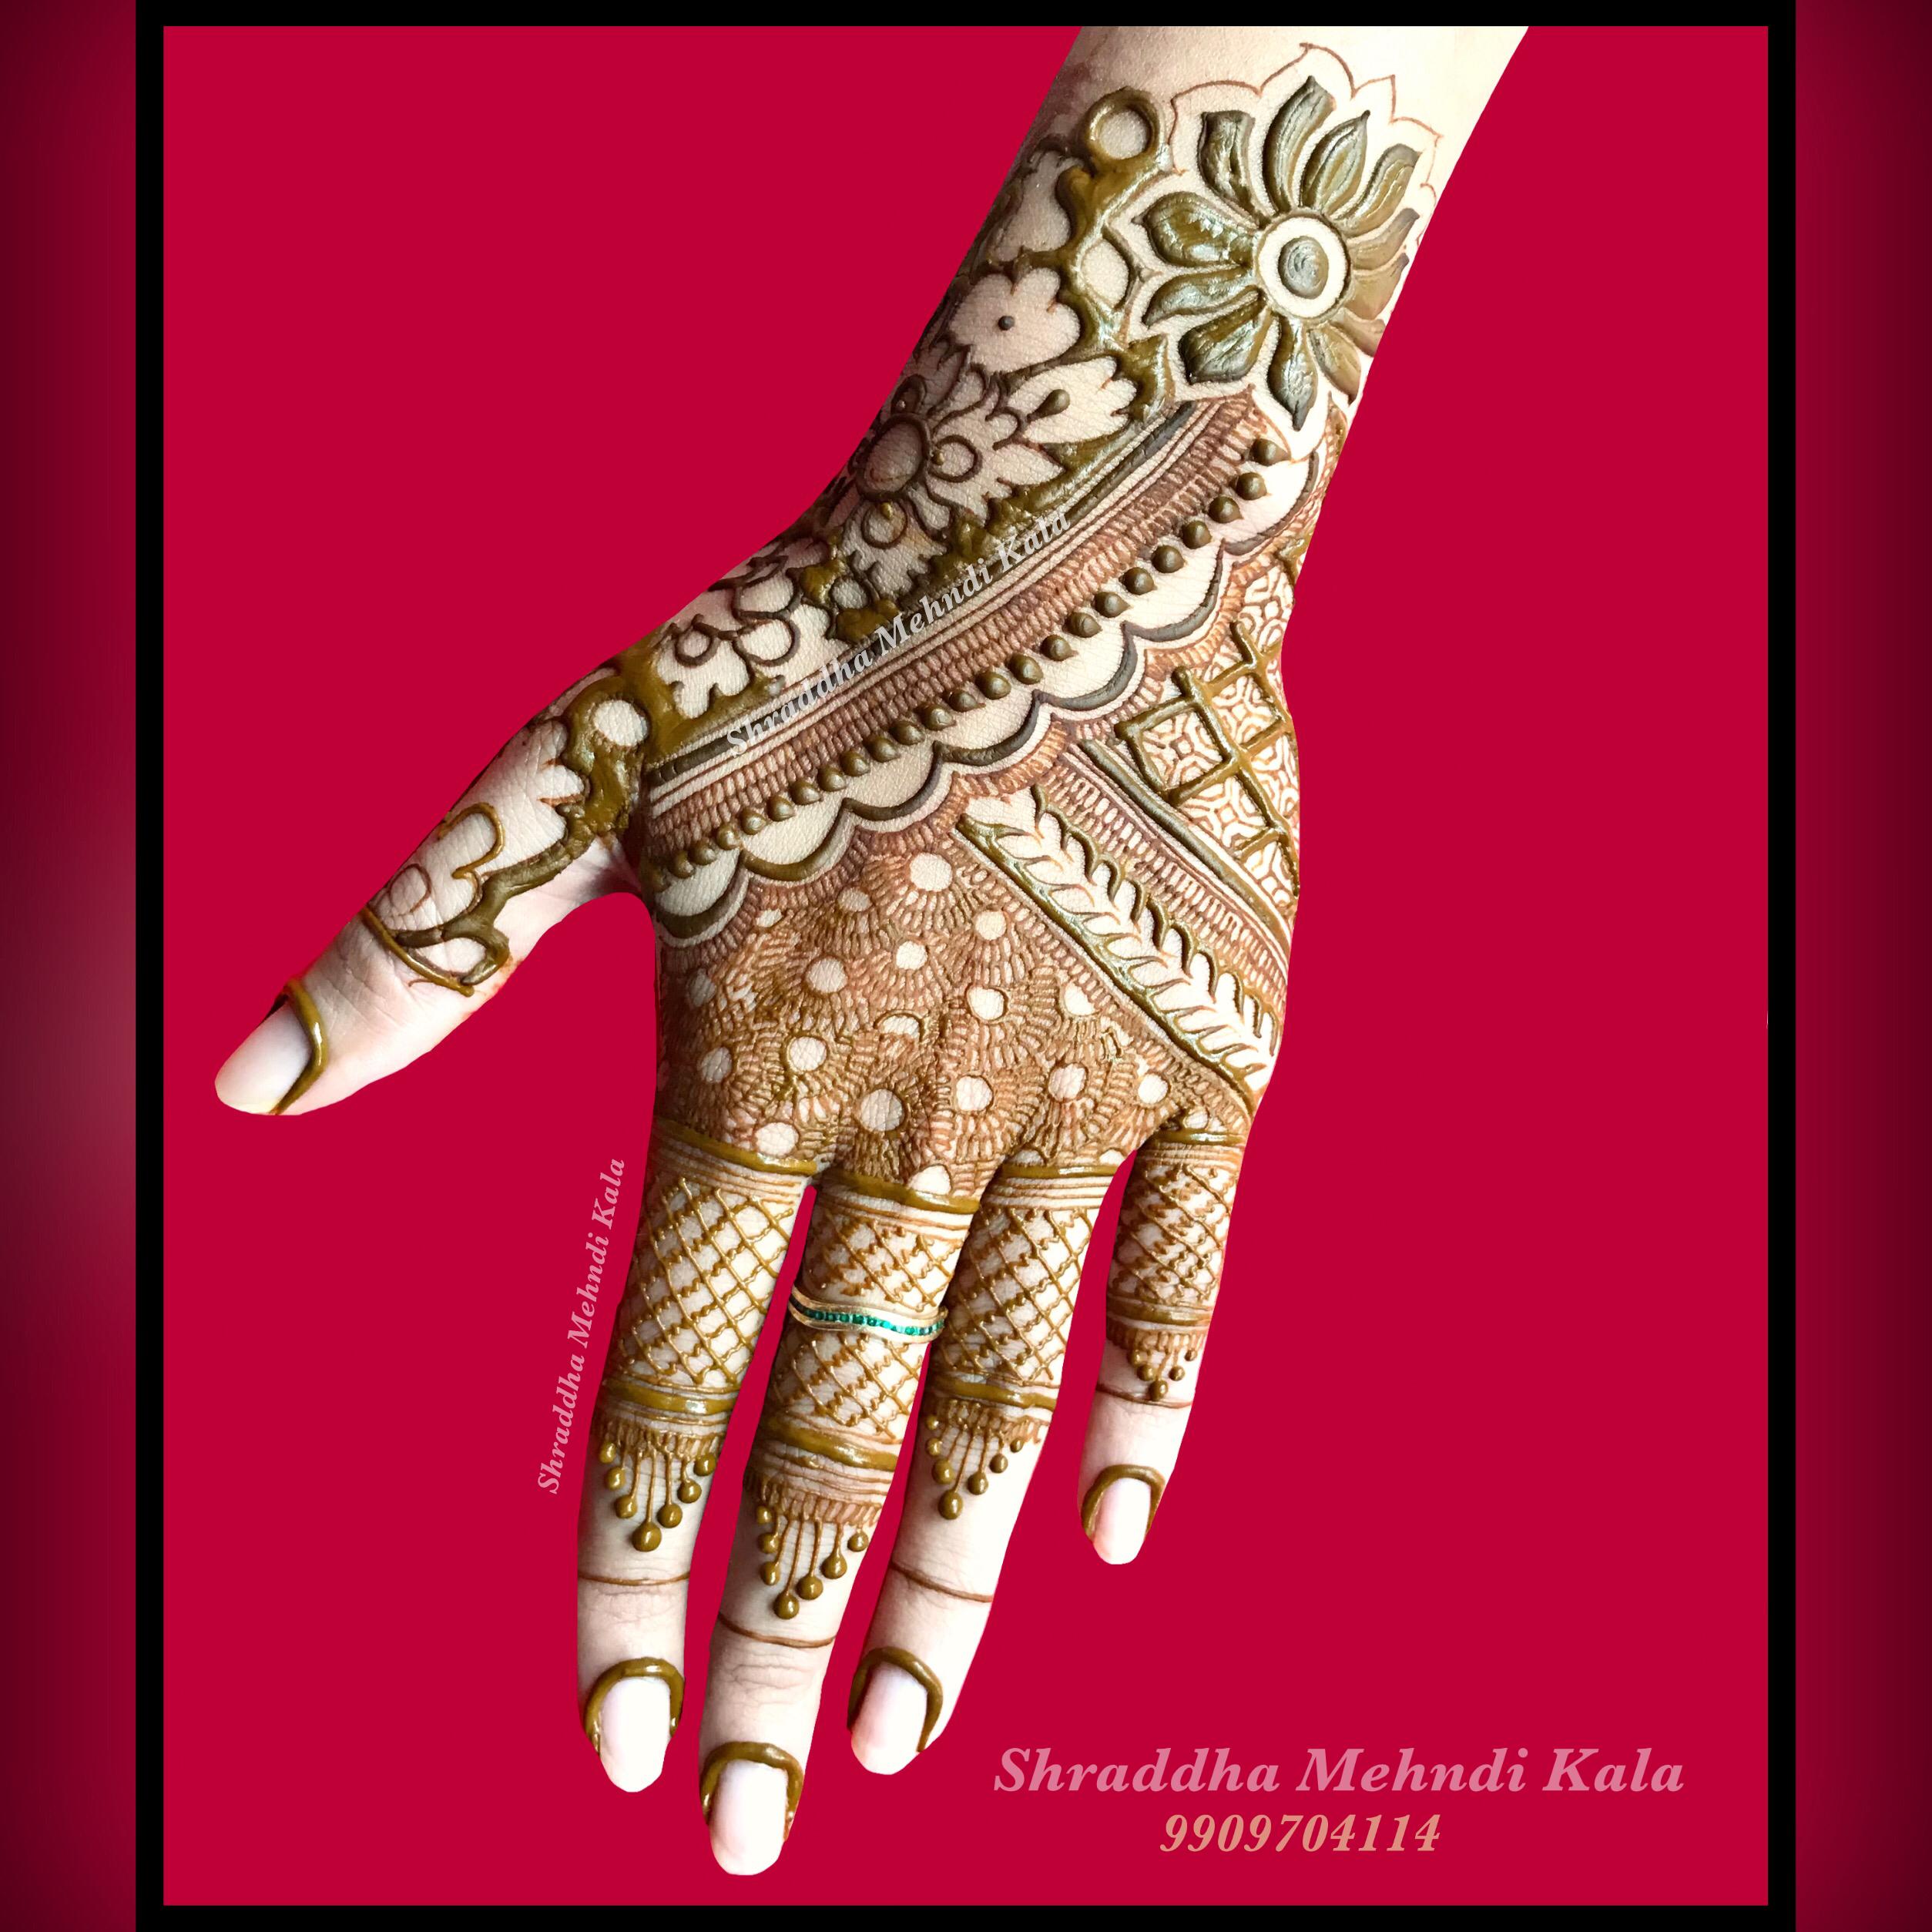 Pin By Nenny On Mehndi Design Mehndi Designs Dulhan Mehndi Designs Hand Mehndi